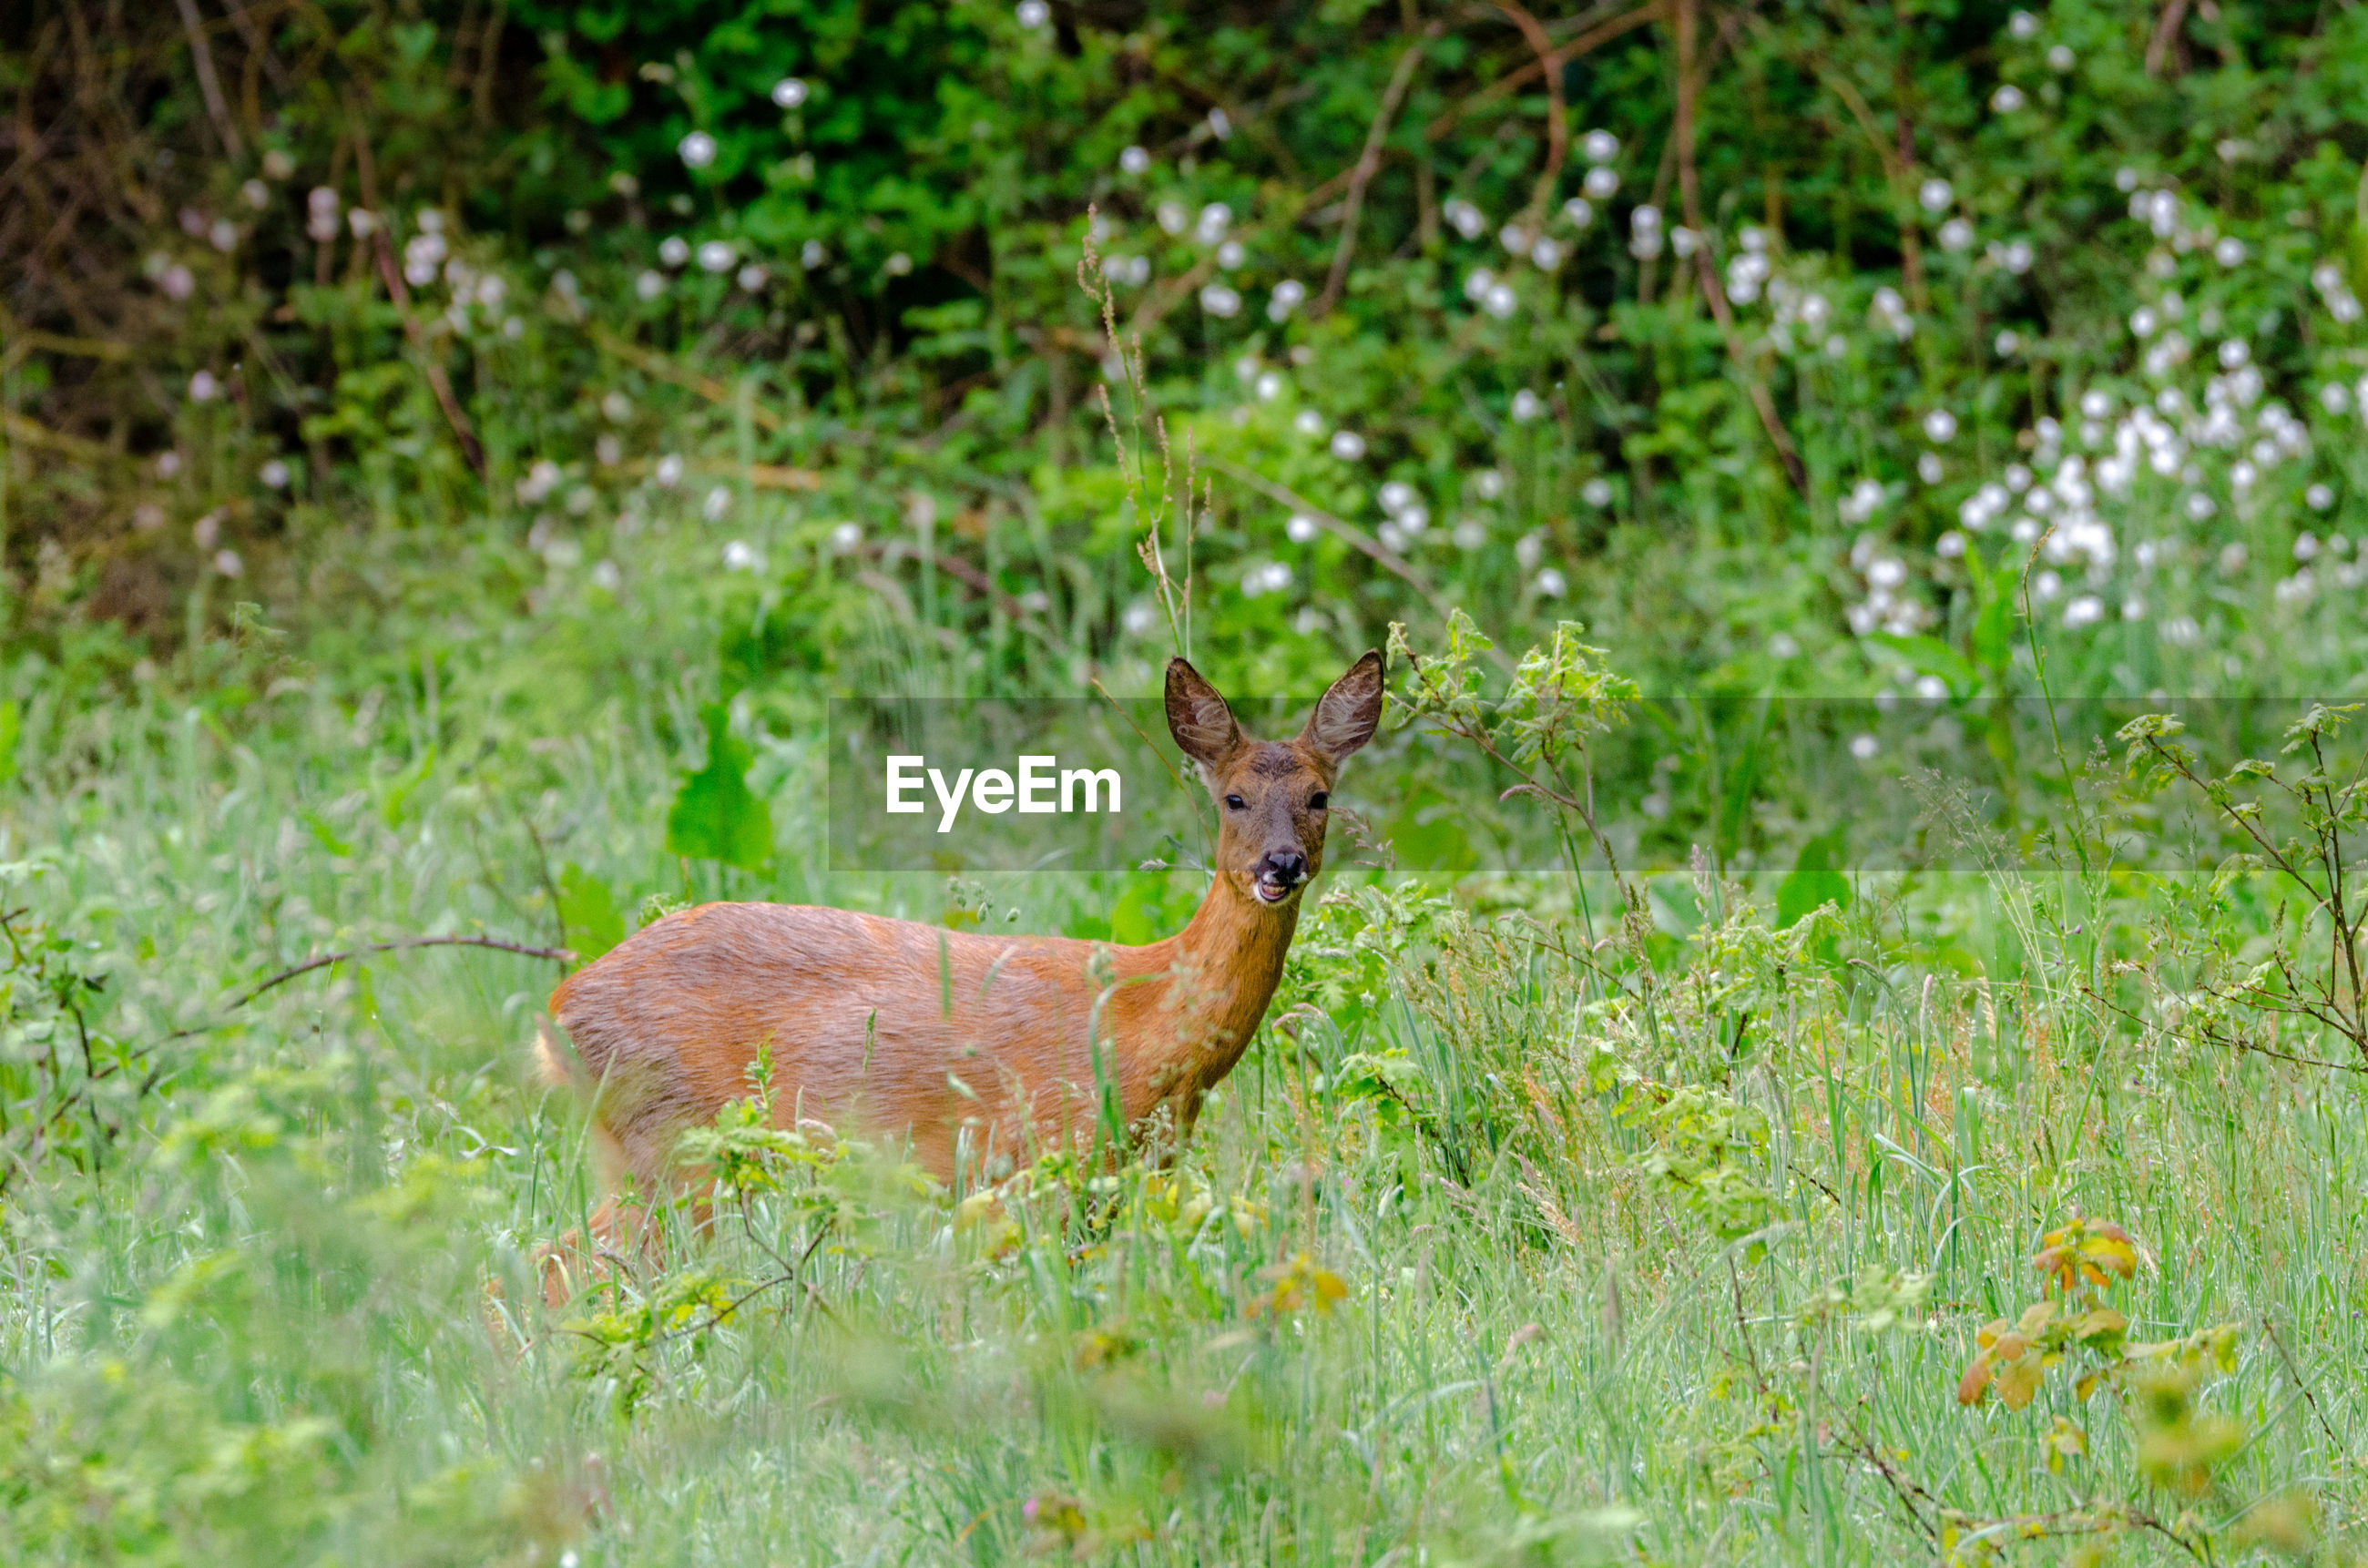 SIDE VIEW OF DEER IN GREEN FIELD